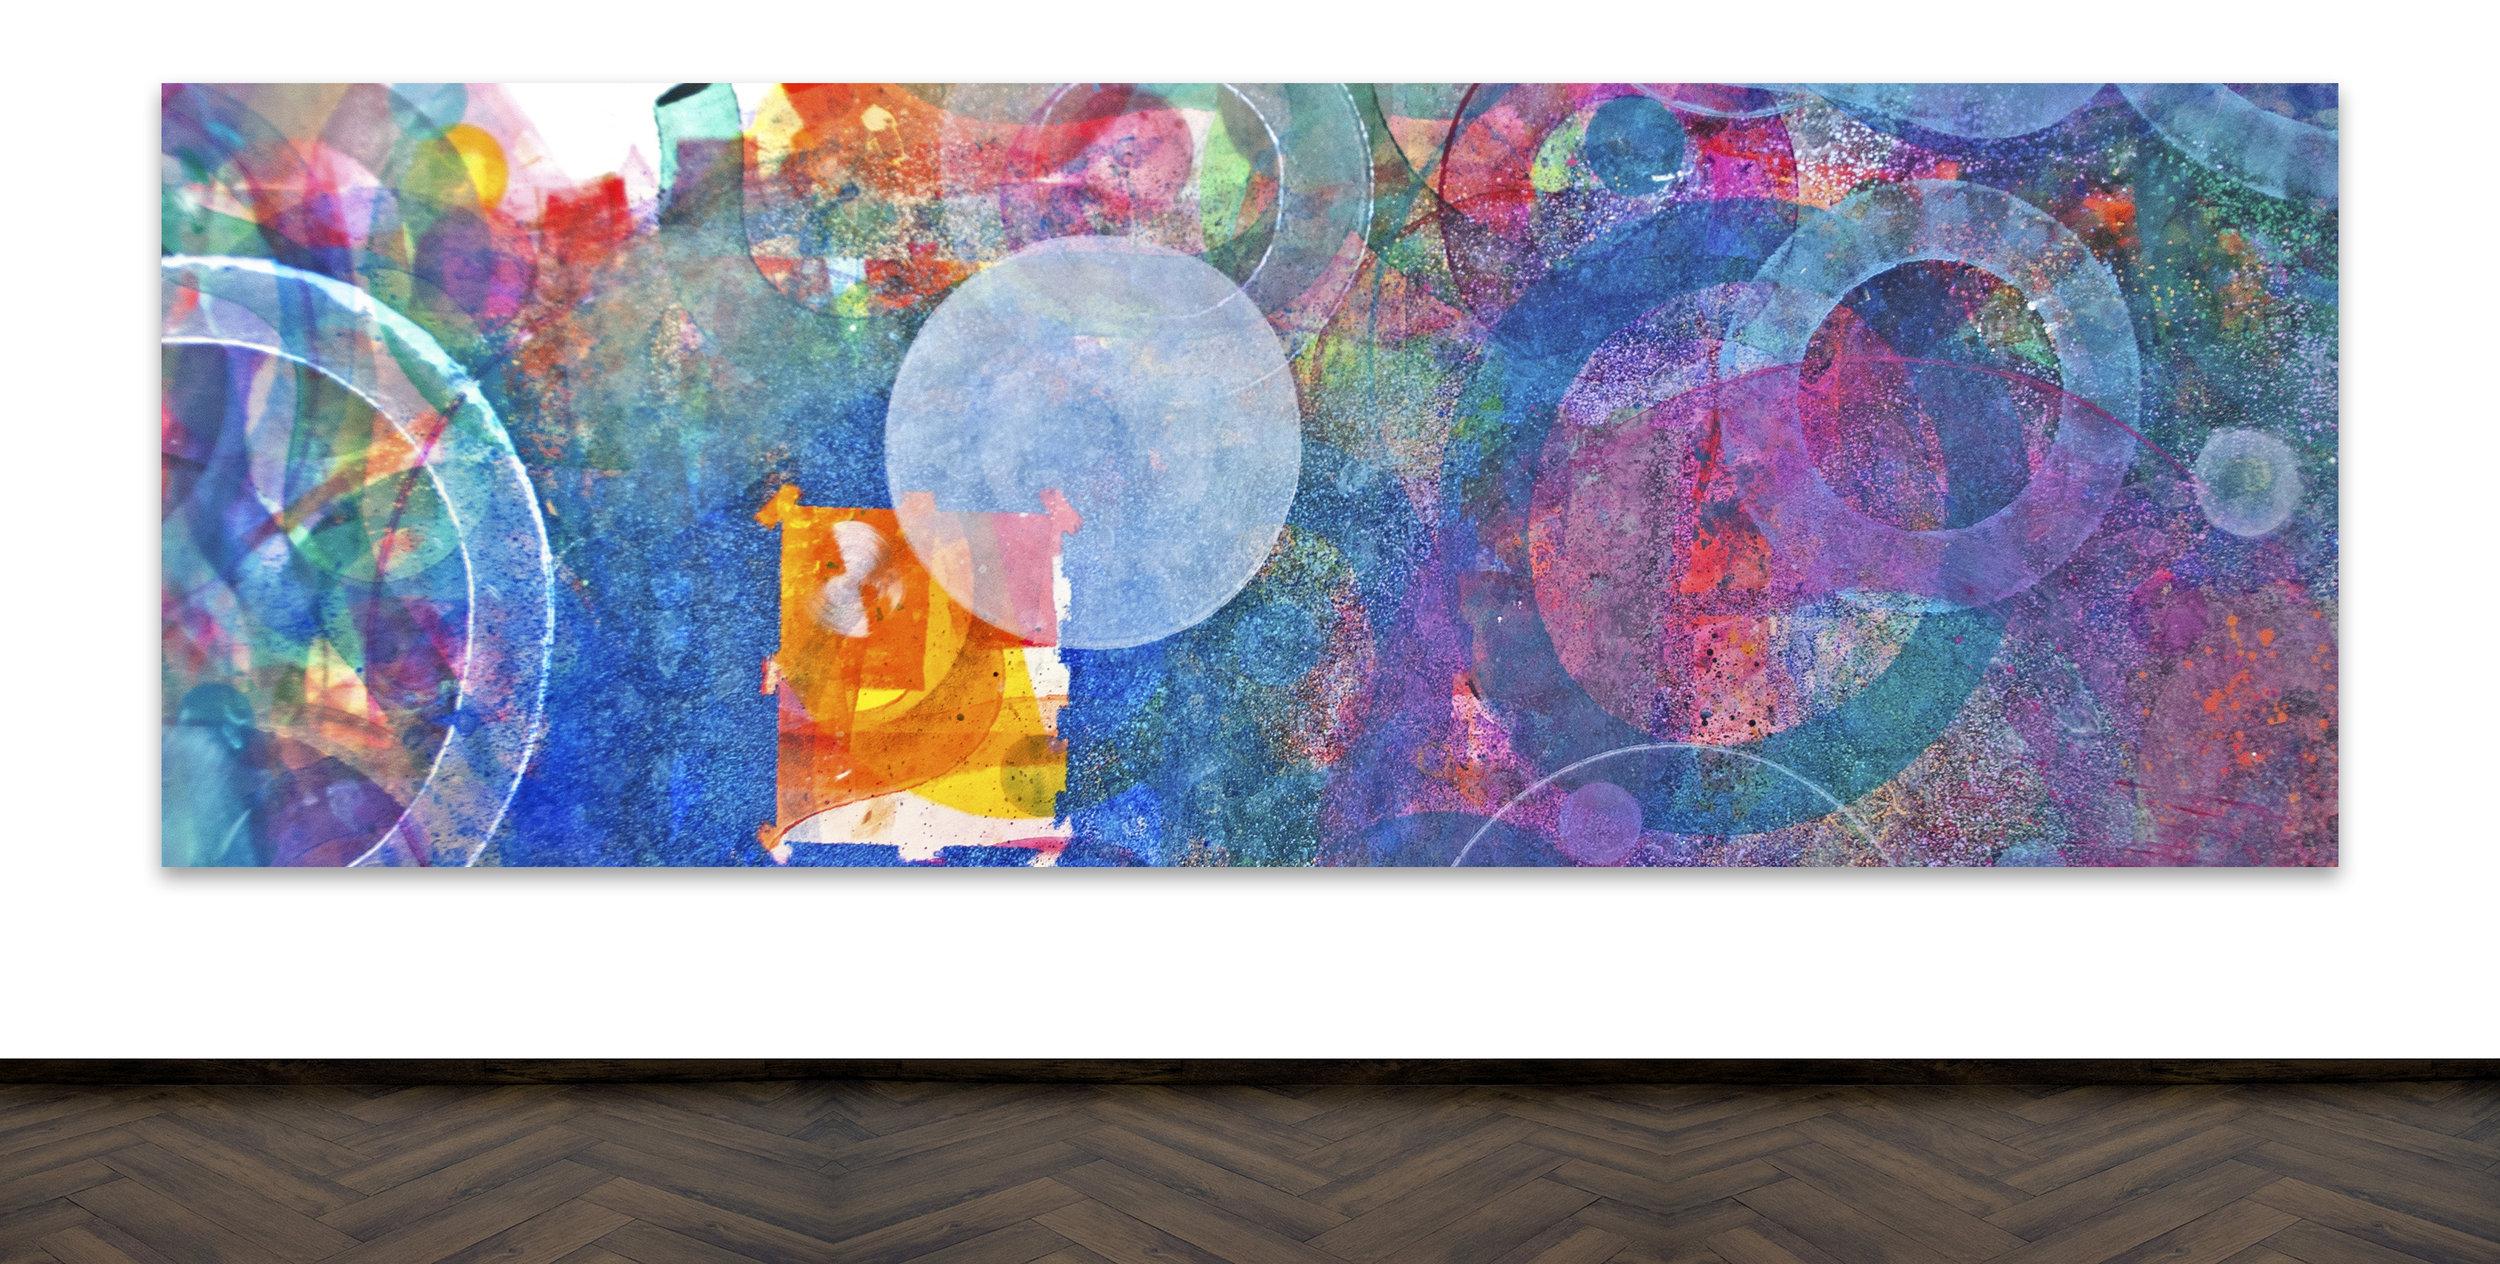 Skoya Assémat-Tessandier, Peinture Automatique XXVI, 2015 180cm x 495cm, Acrylic on canvas, wooden stretchers.